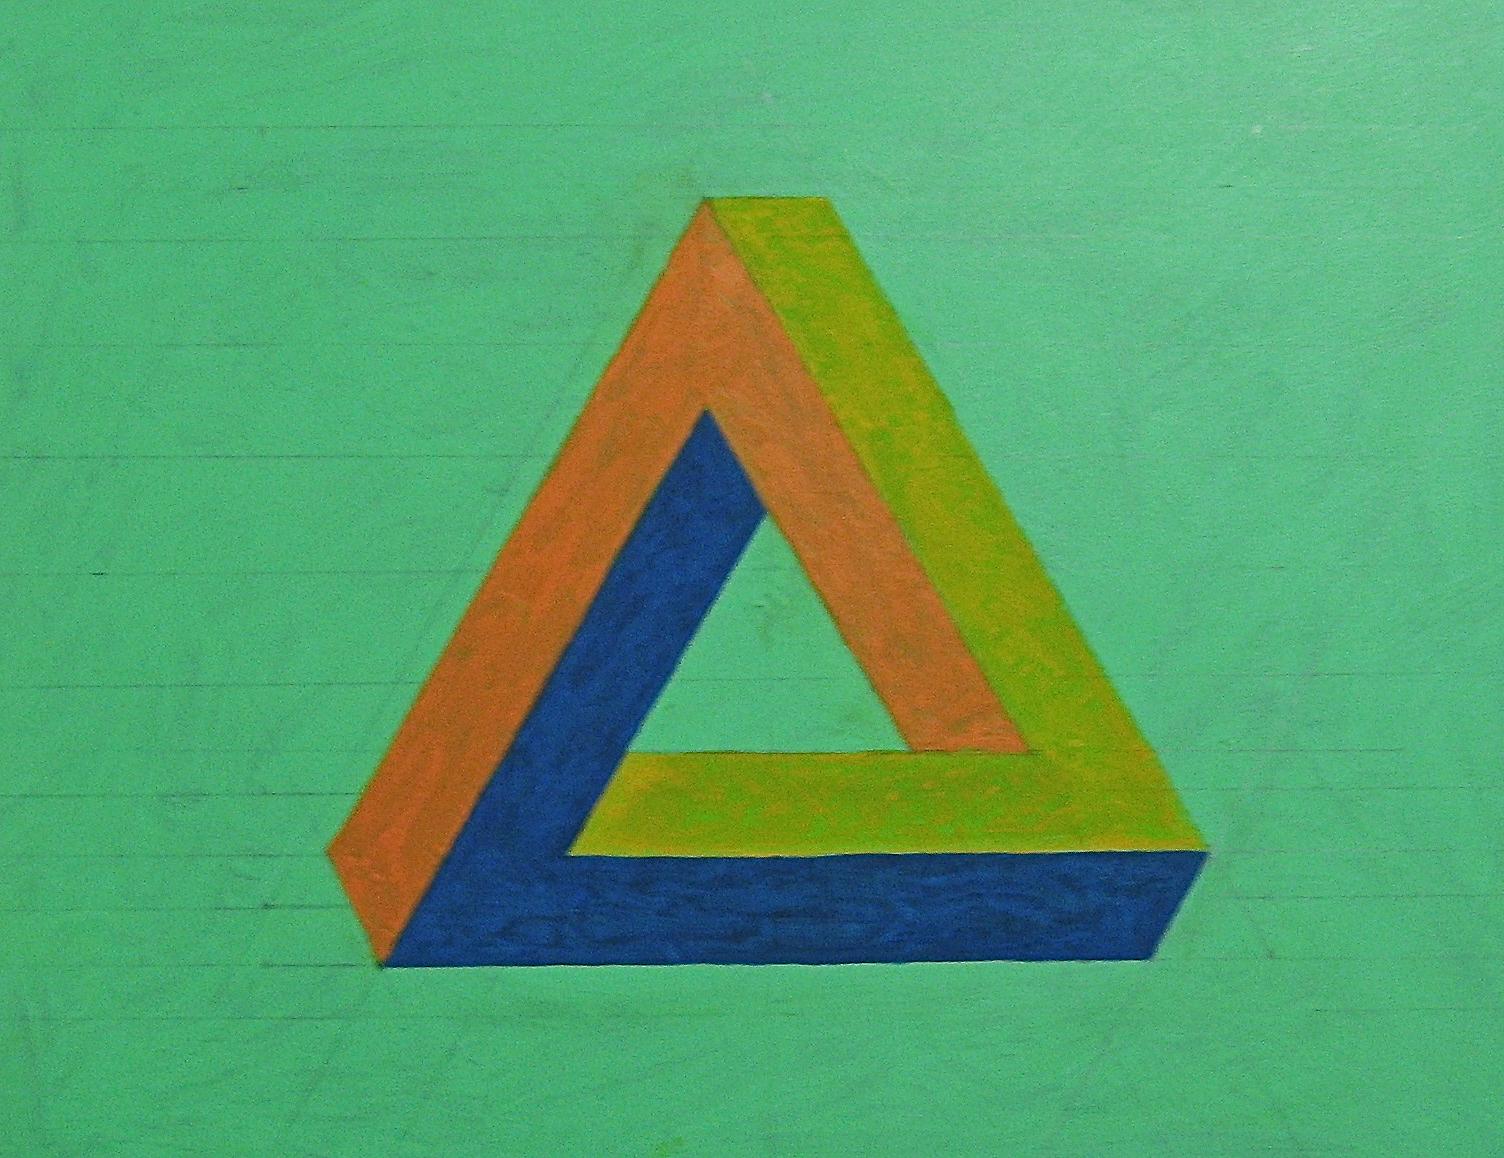 Penrose split complements